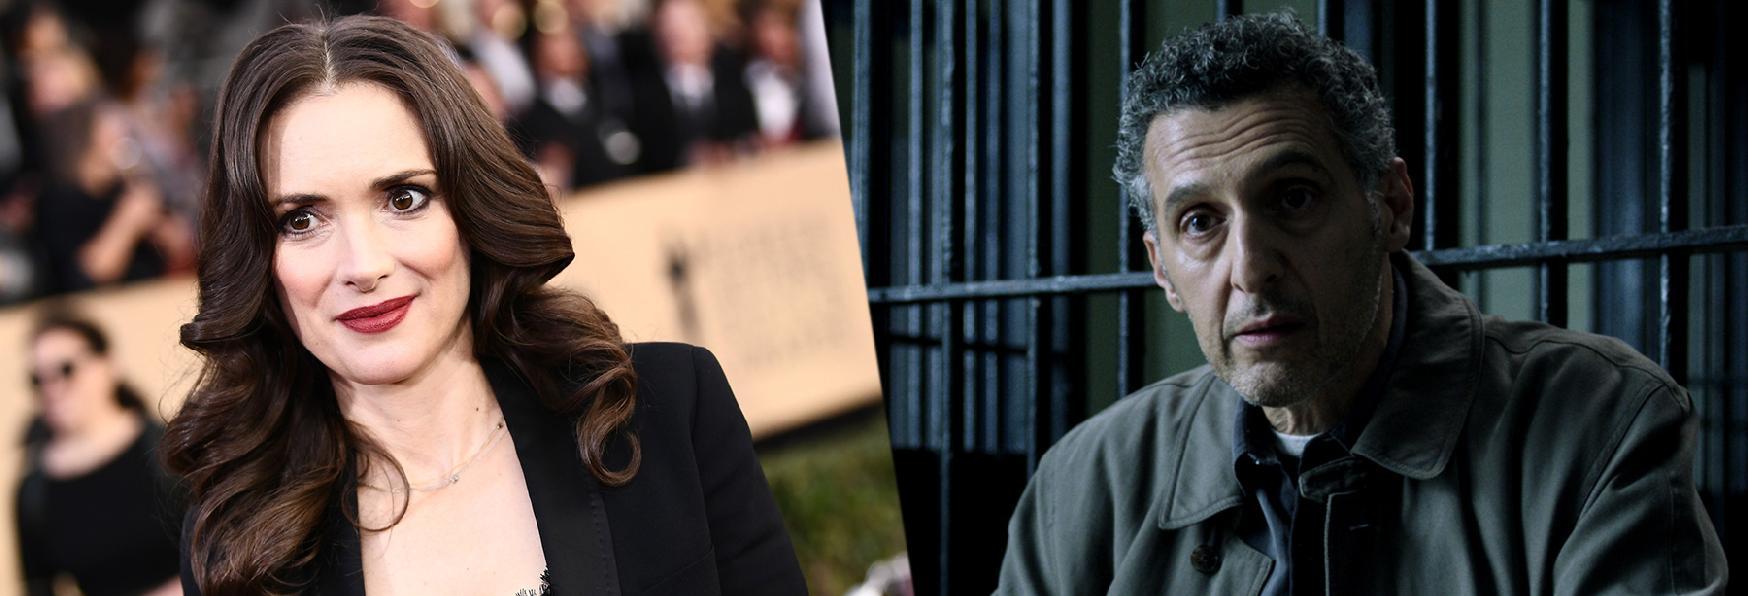 Plot Against America: nuova Miniserie HBO Winona Ryder e John Turturro nel Cast